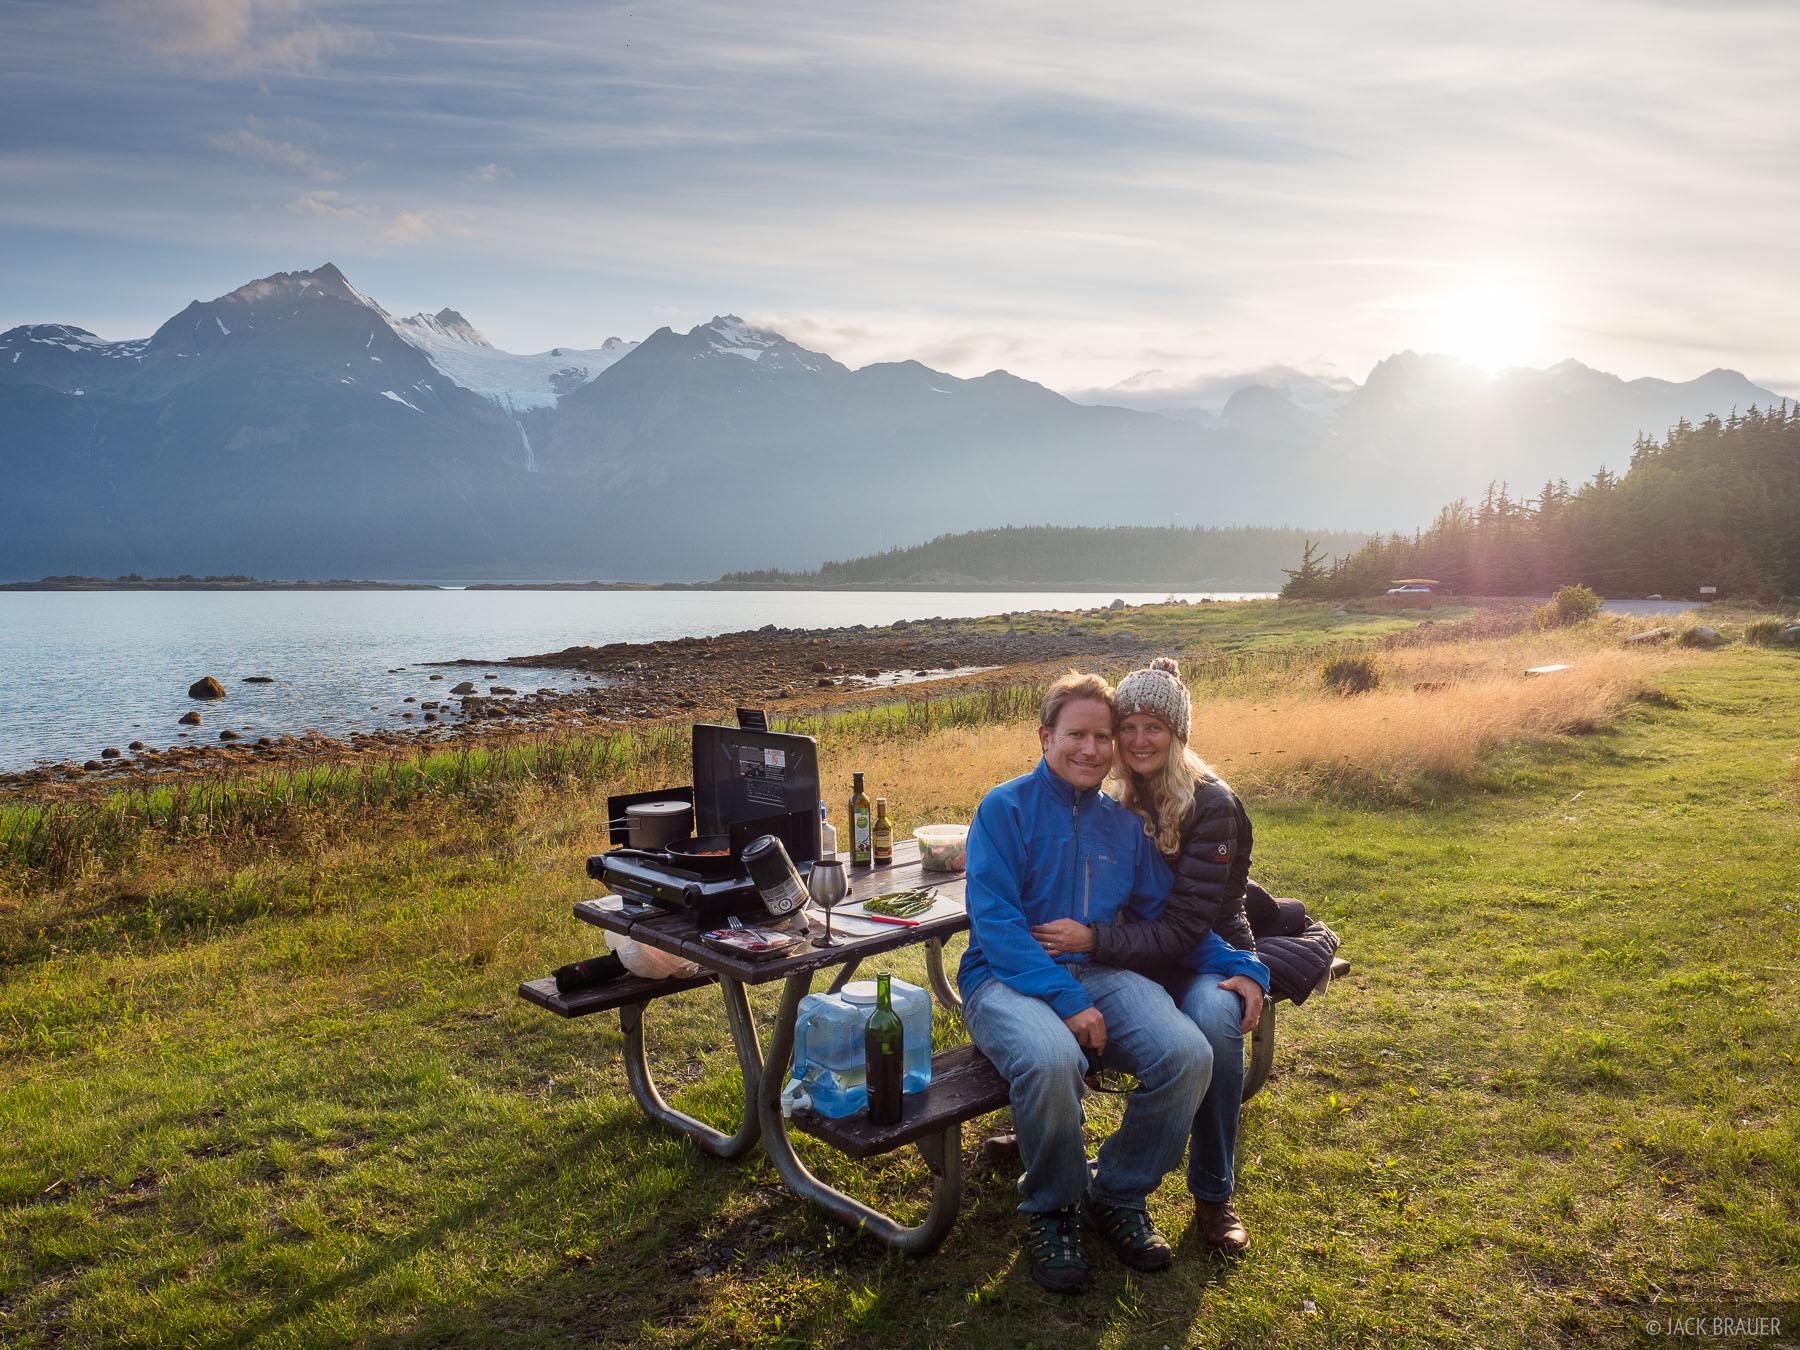 Alaska, Chilkat State Park, Haines